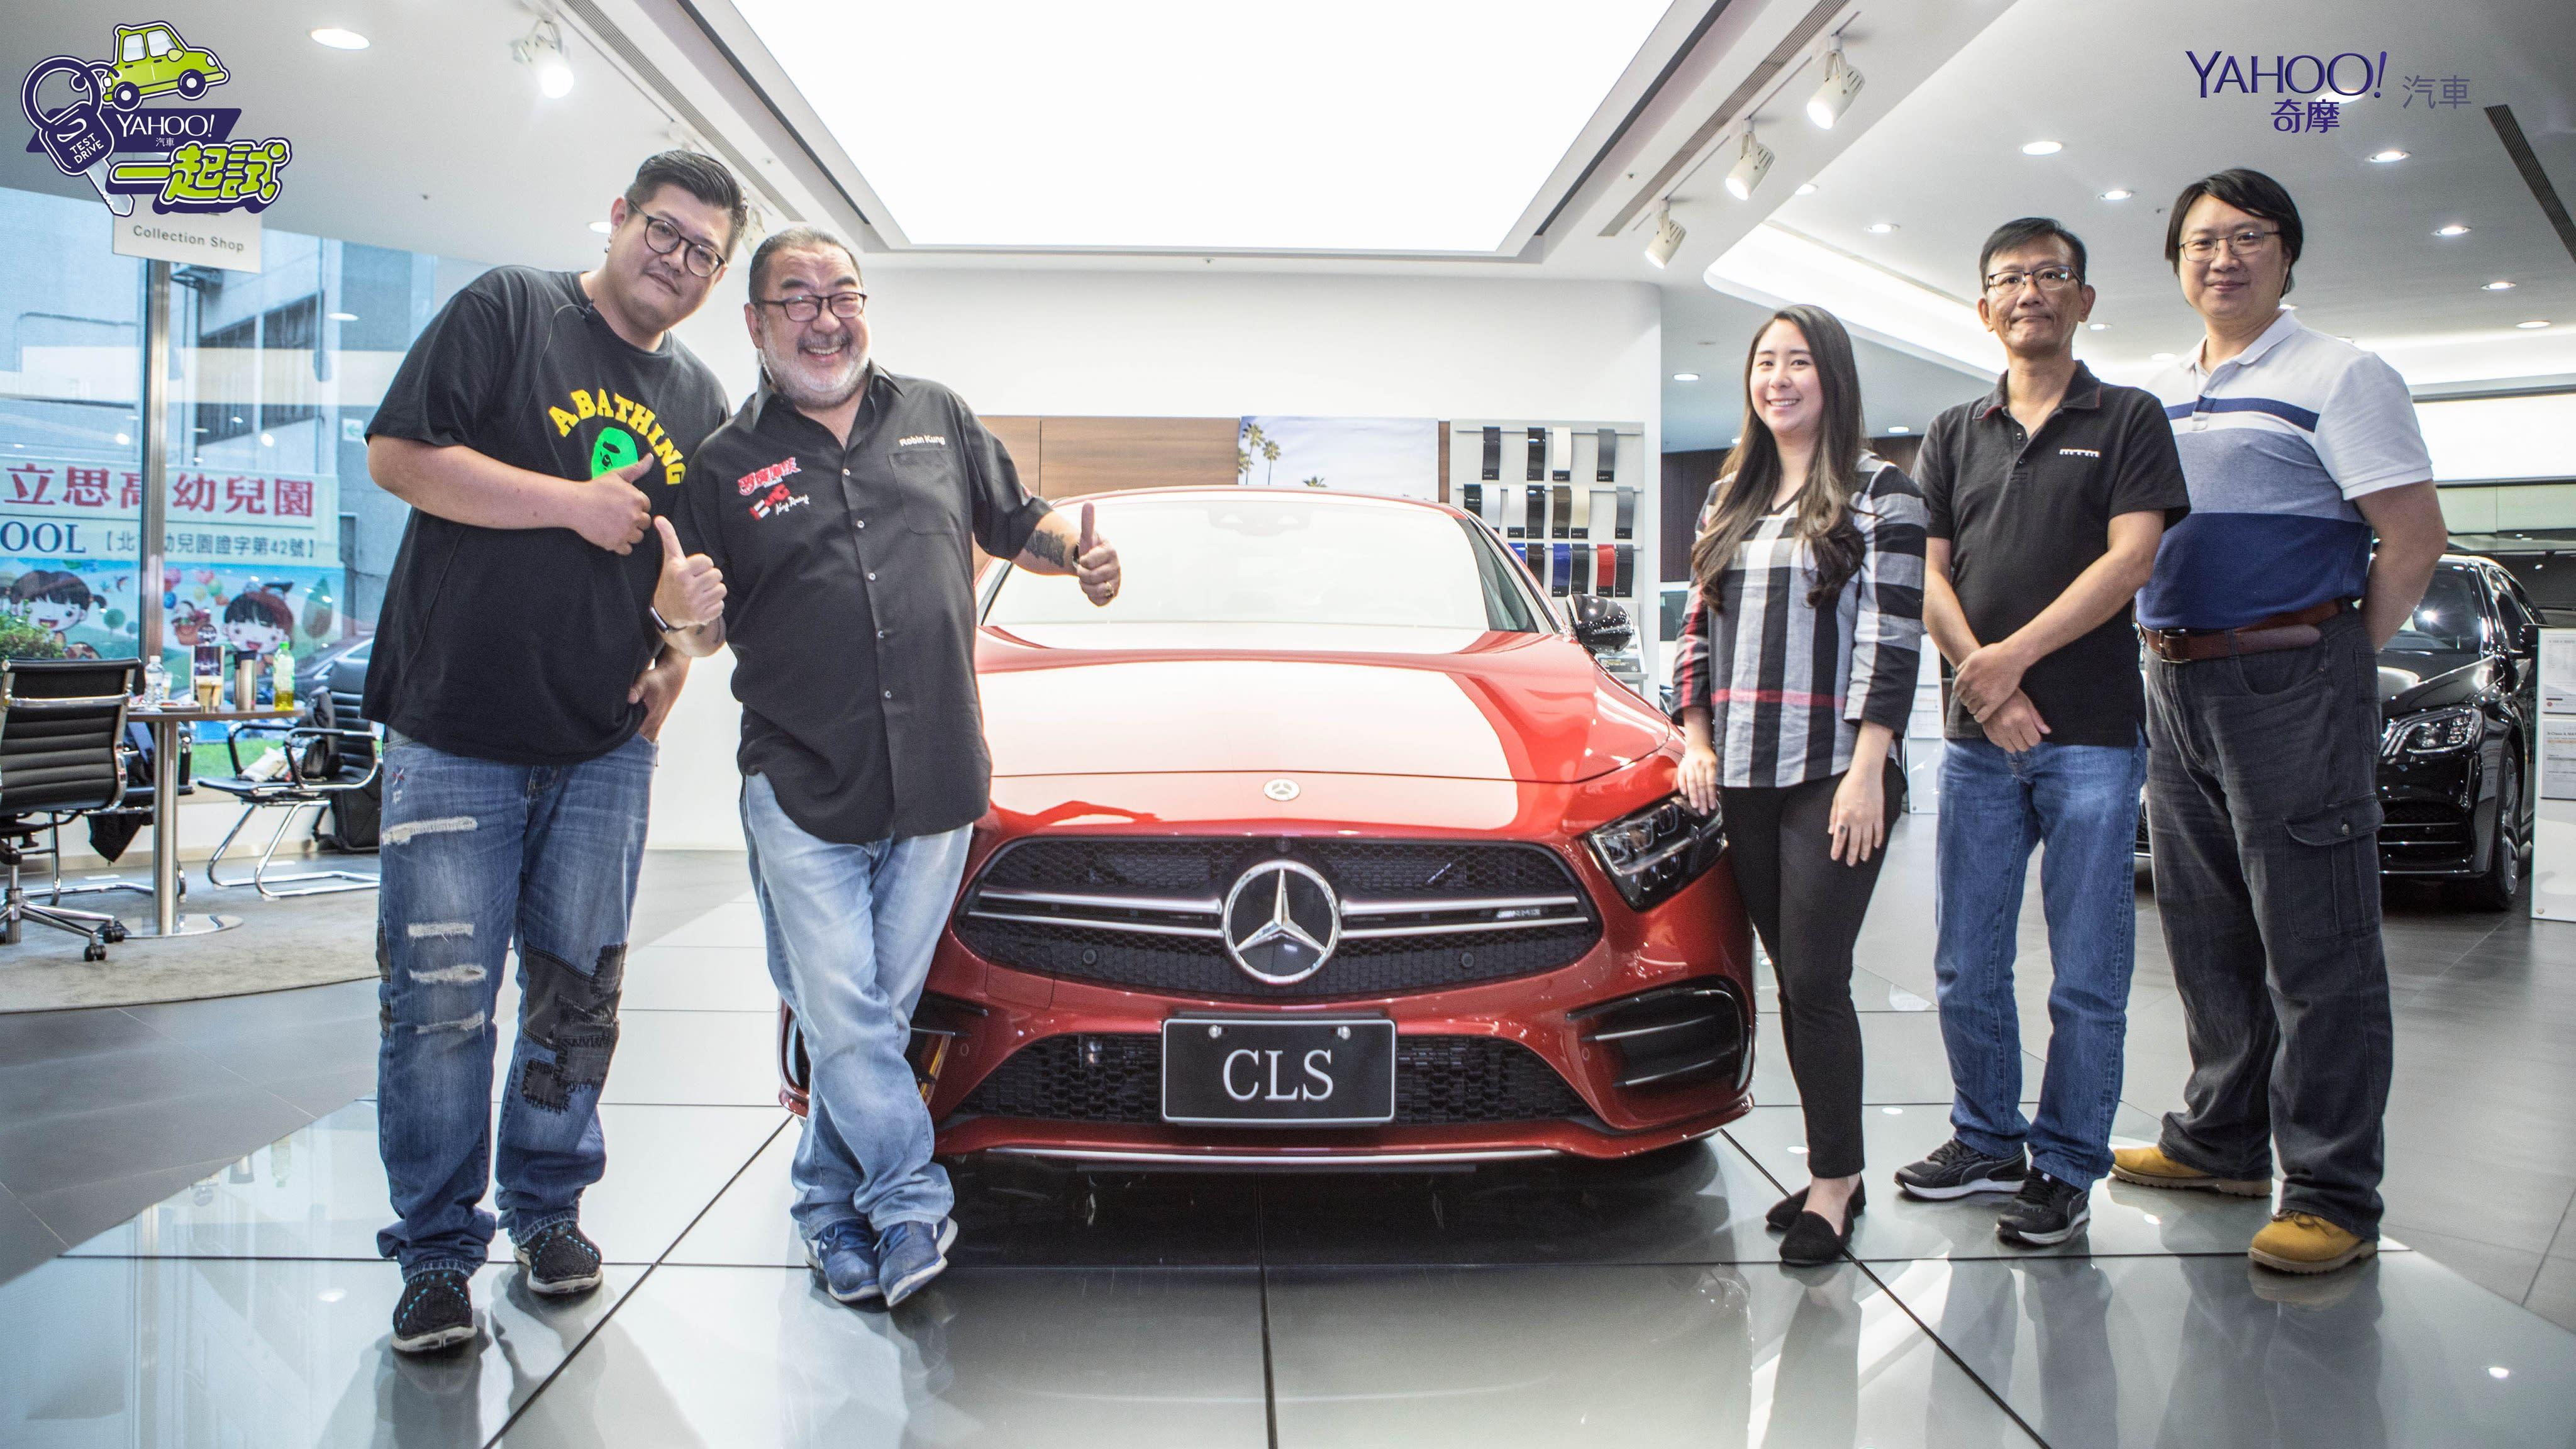 【Yahoo汽車一起試】Vol.13 創新市場的先鋒者:Mercedes Benz CLS 350